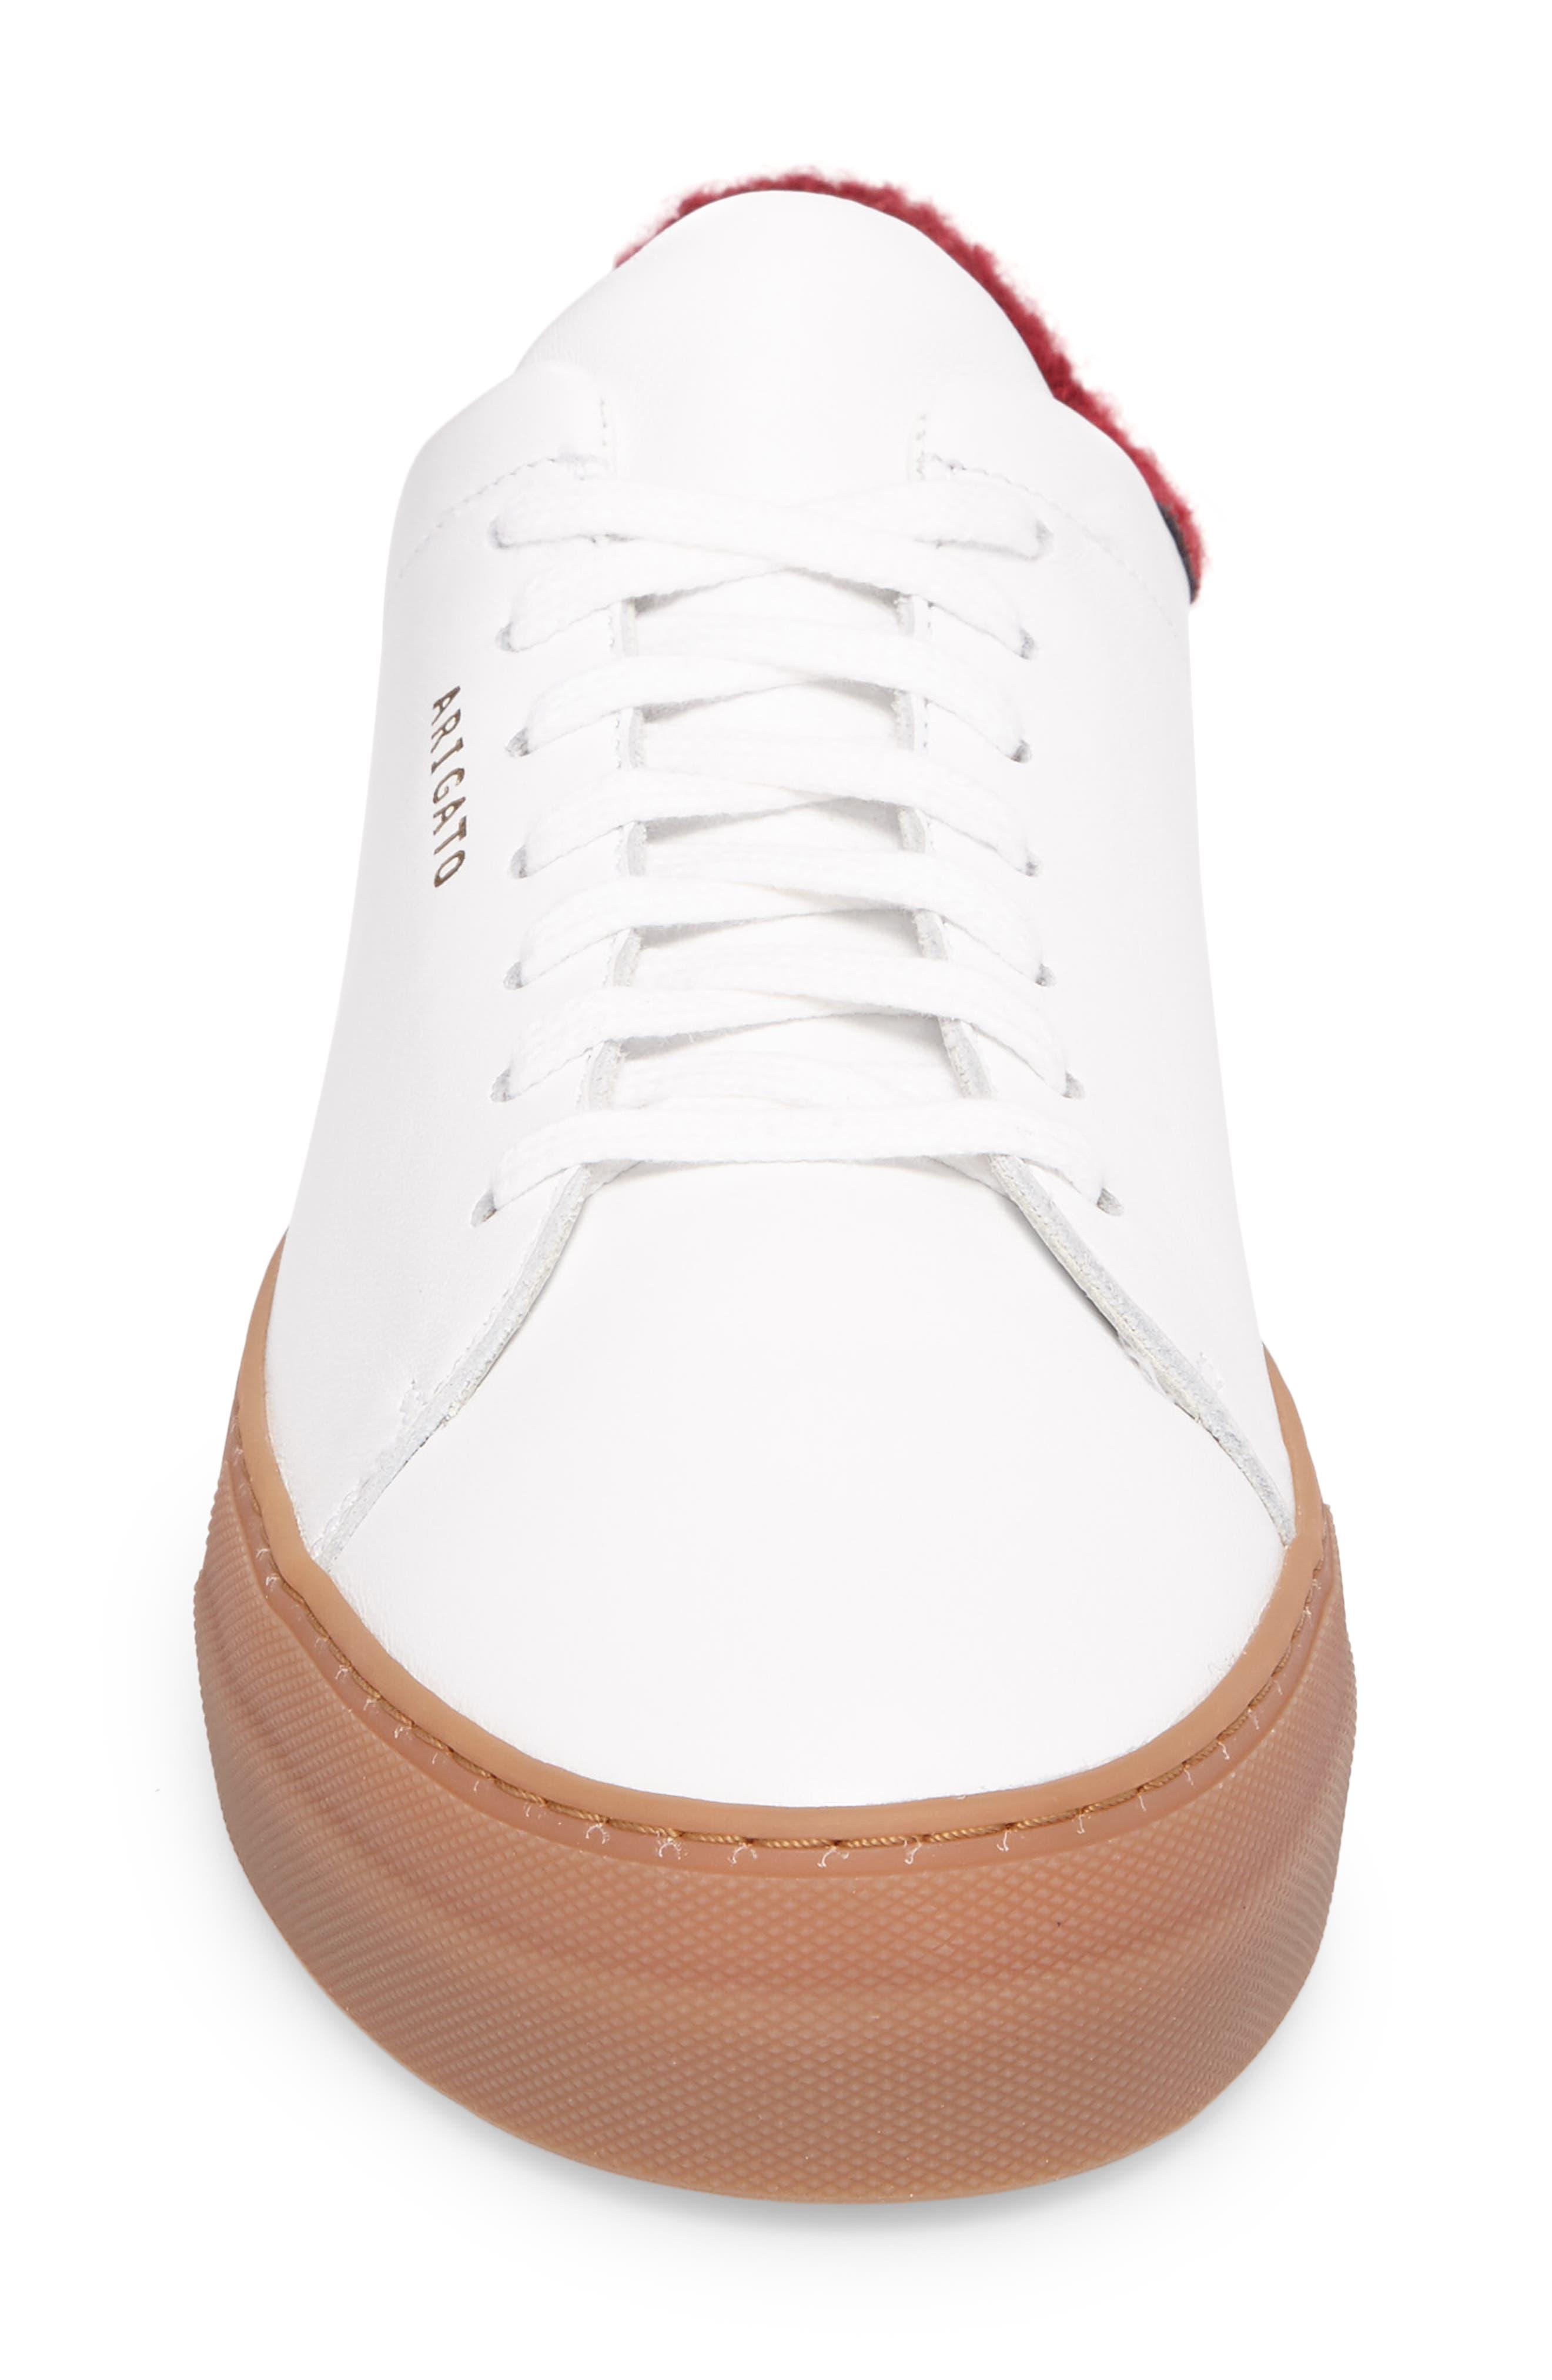 Clean 360 Fuzzy Heel Sneaker,                             Alternate thumbnail 4, color,                             100